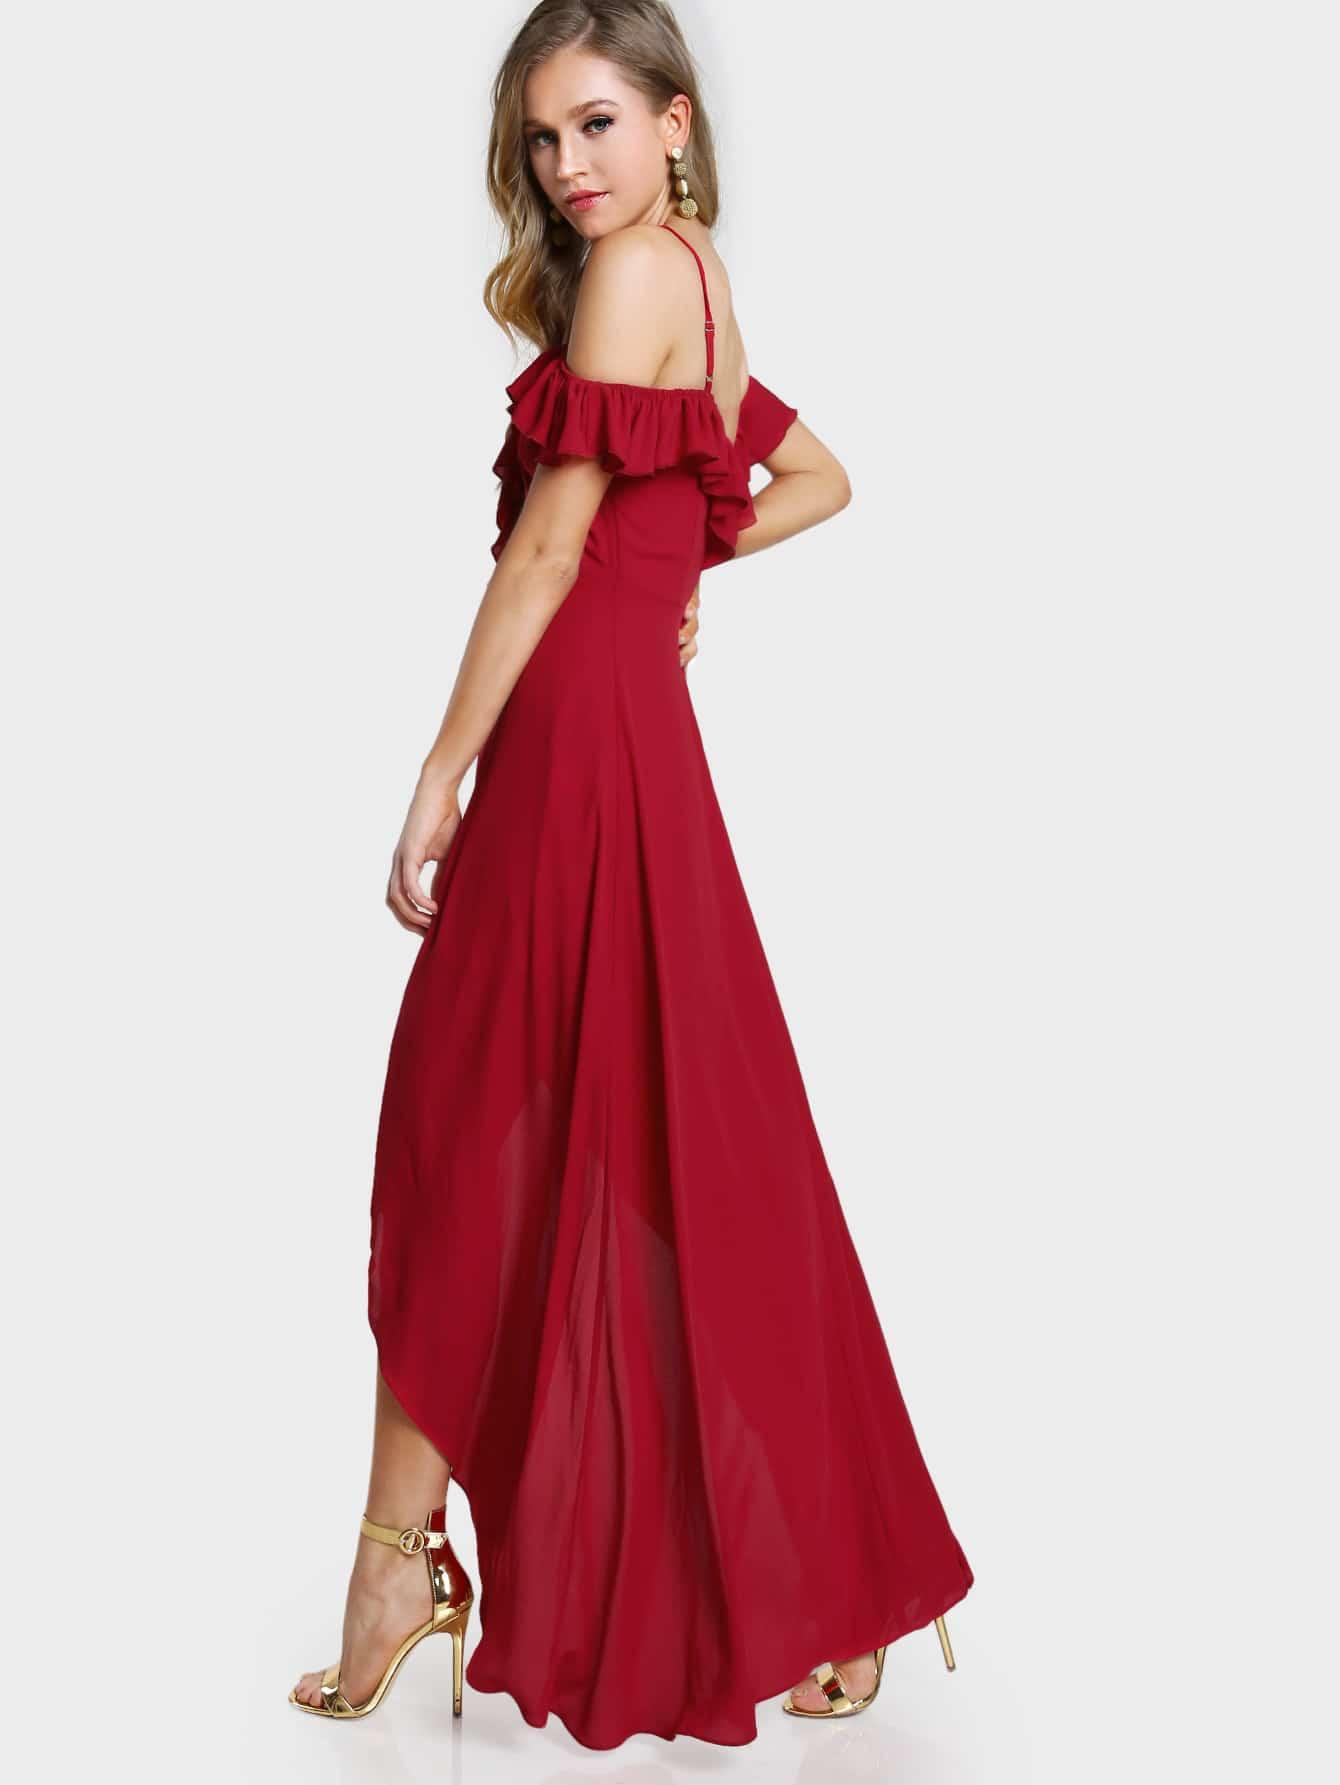 Frill Cold Shoulder Plunge Sweetheart Wrap Dress